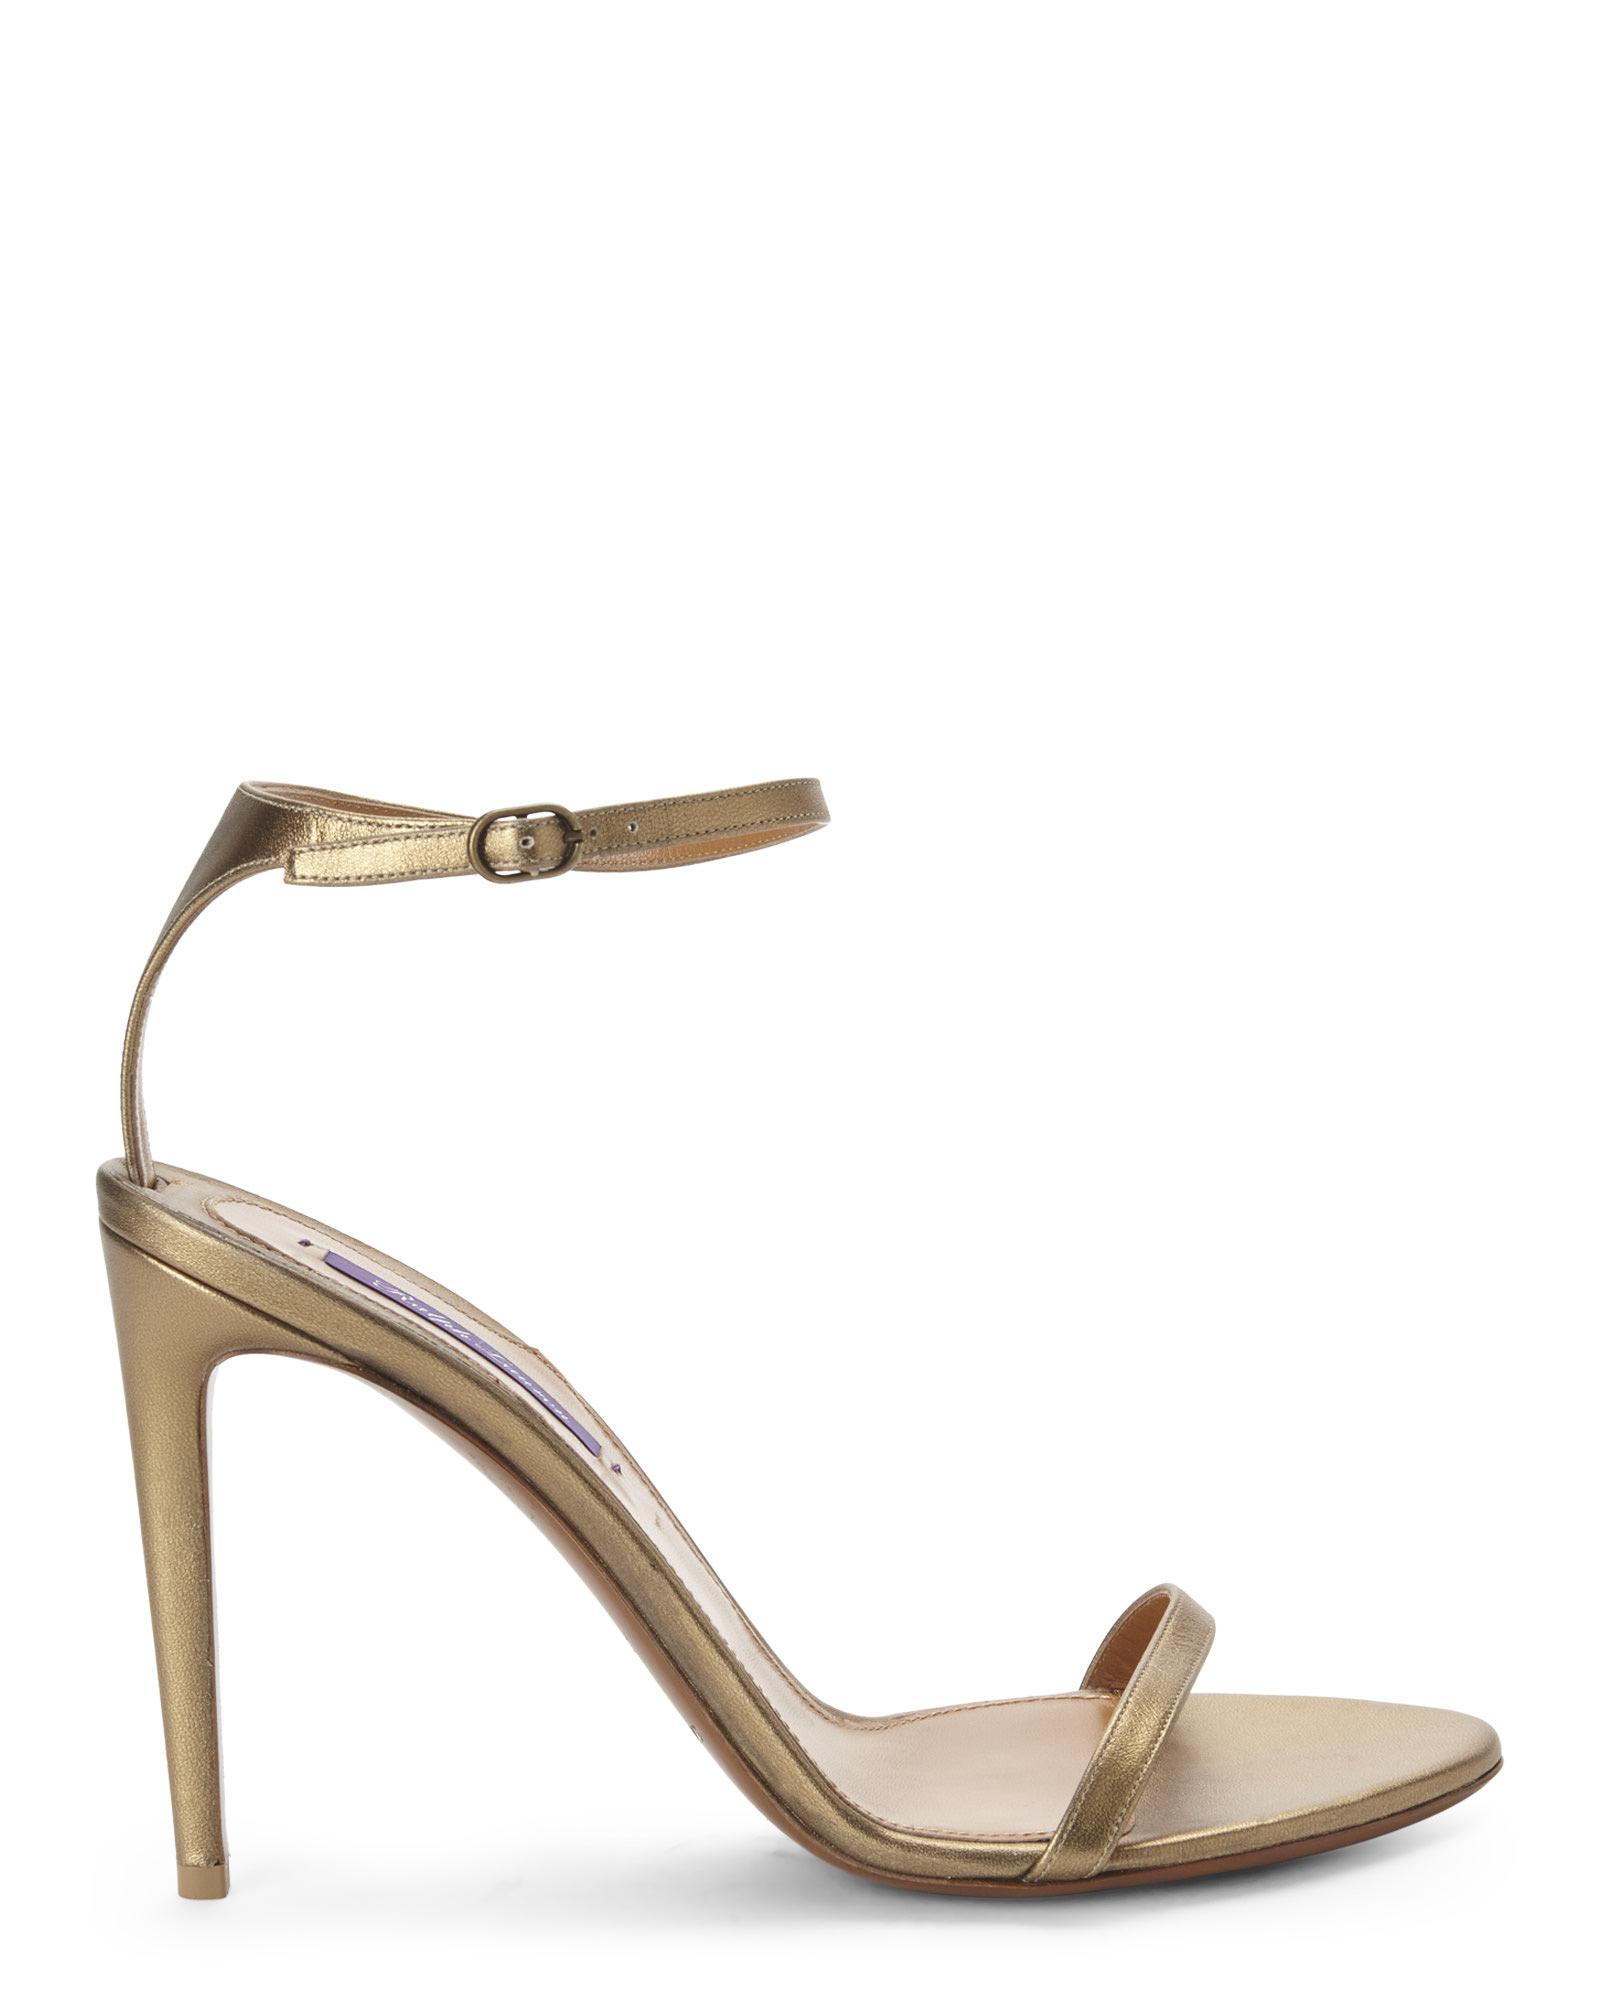 83fcb3f55a3 Lyst - Ralph Lauren Blasia Two-Piece Heeled Sandals in Metallic